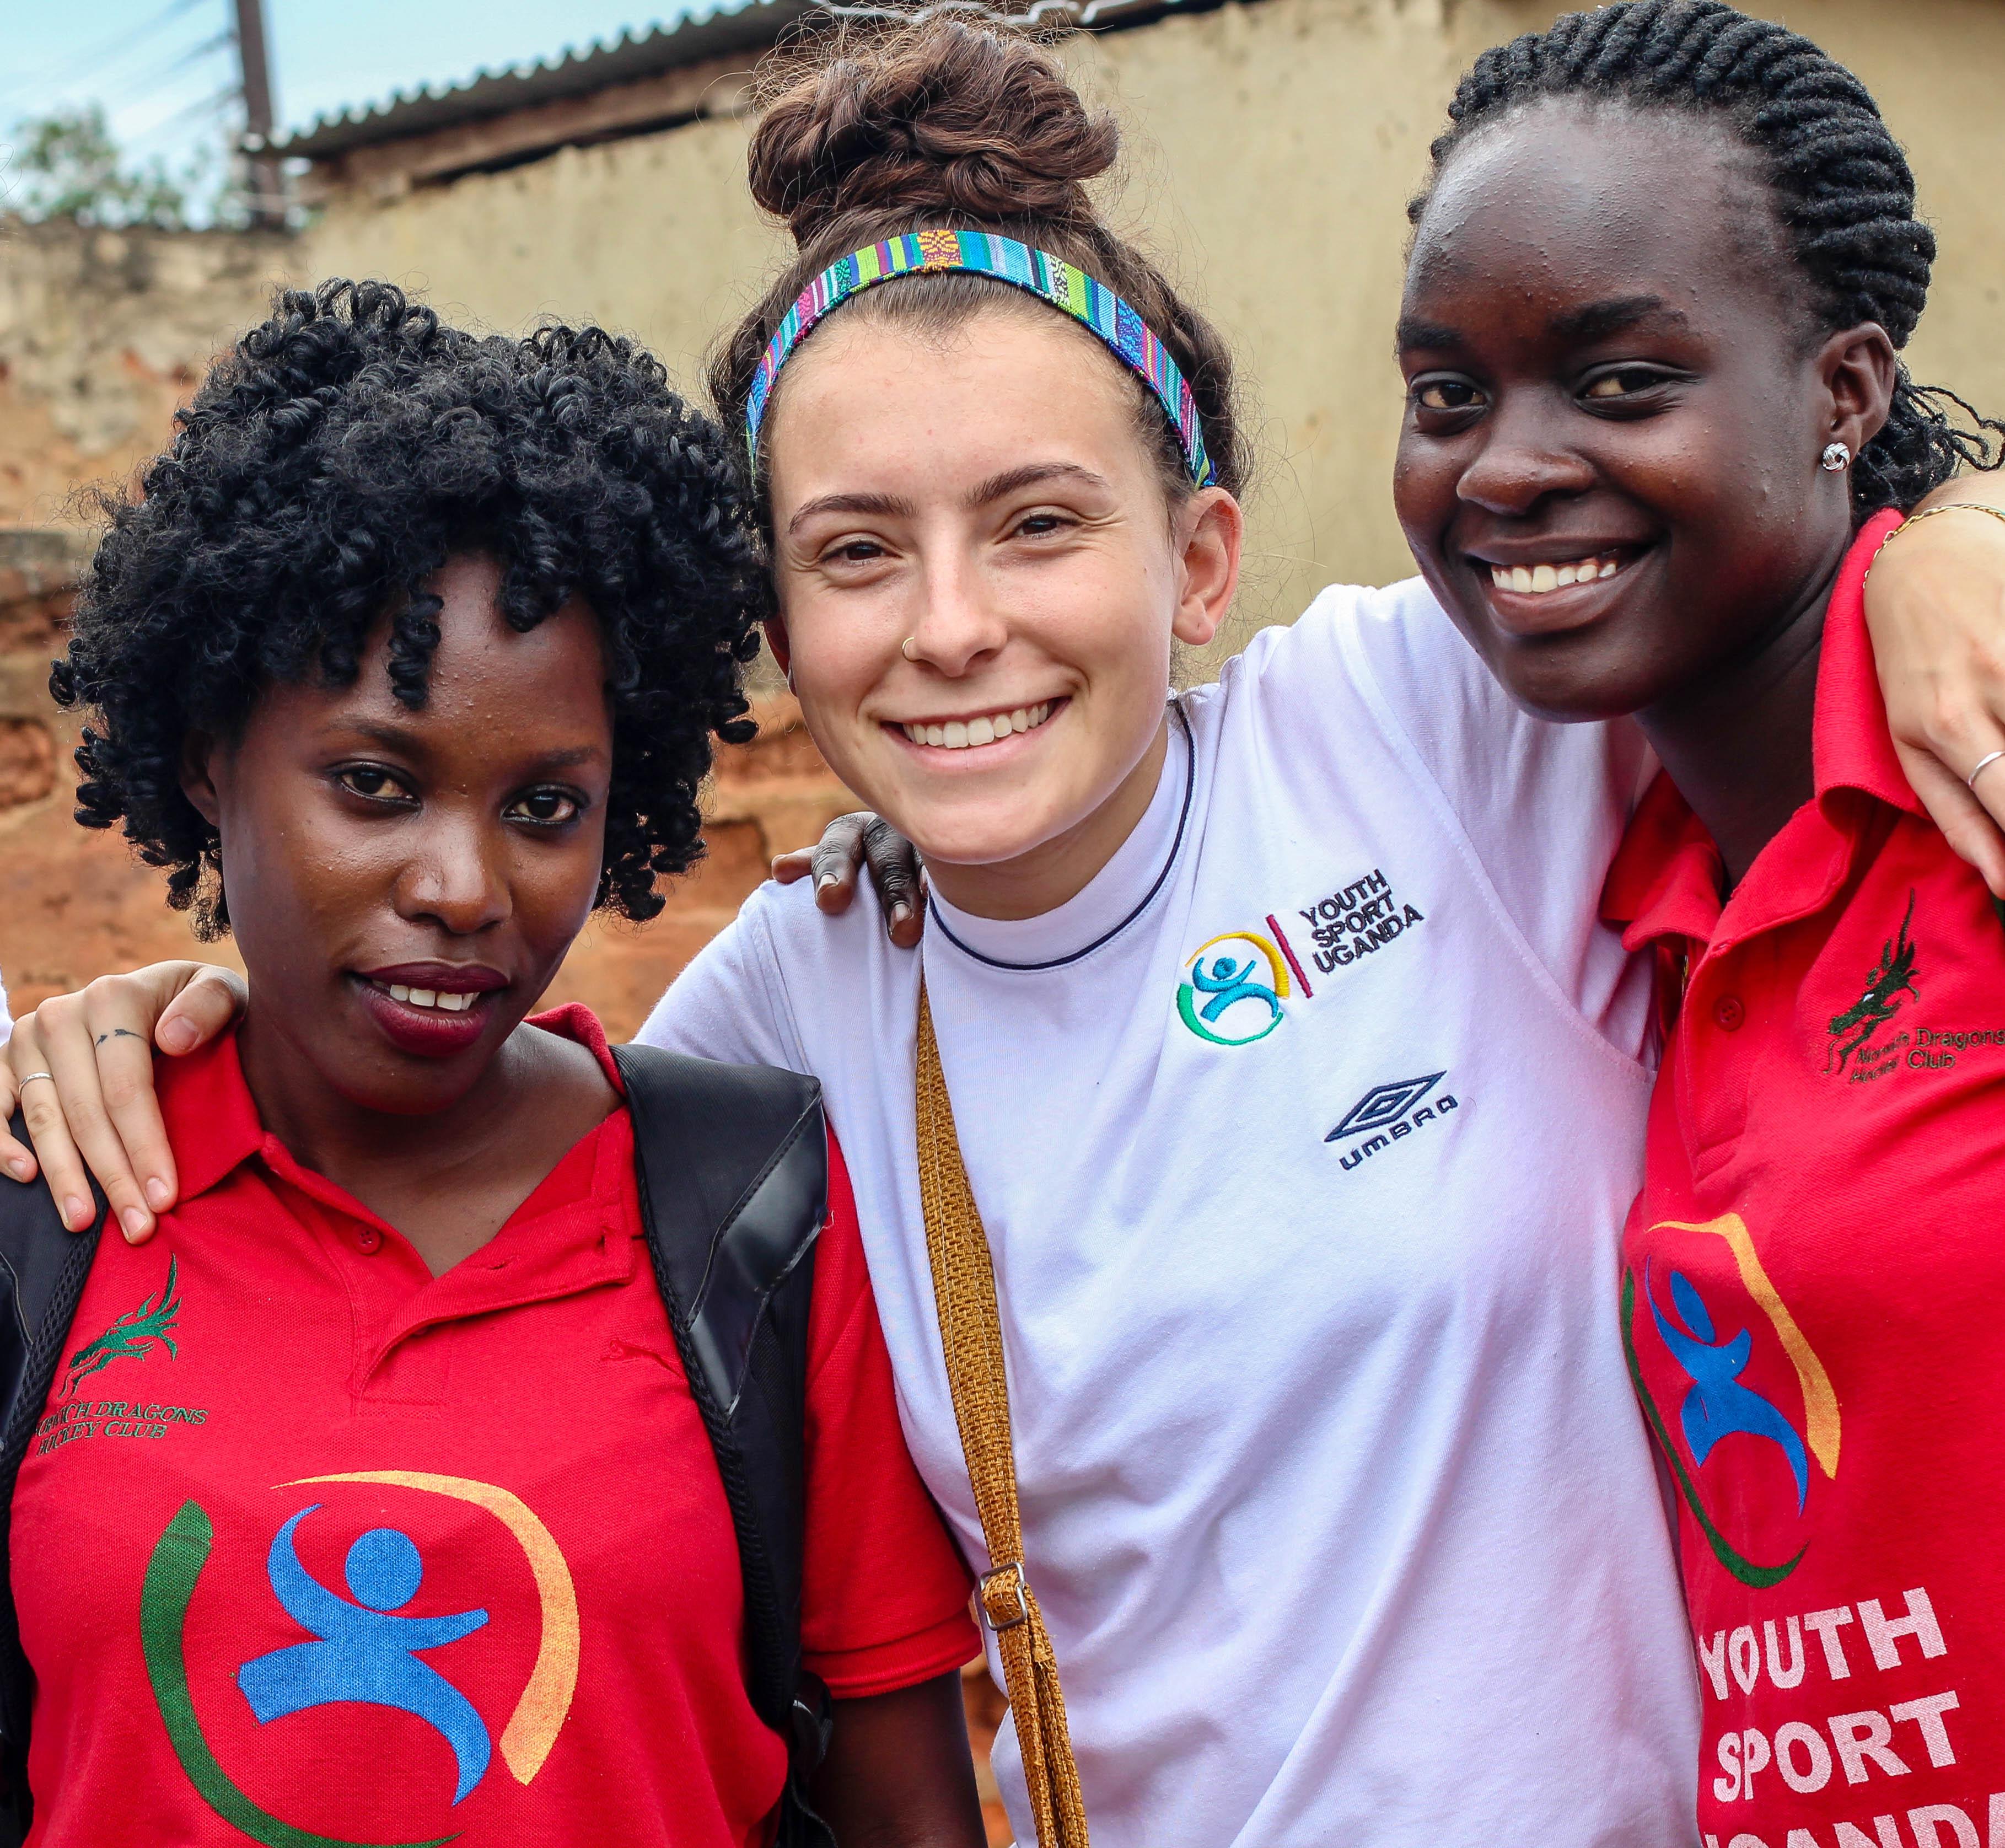 Notre Dame de Namur University graduate Arianna Cunha did a public health internship in Uganda